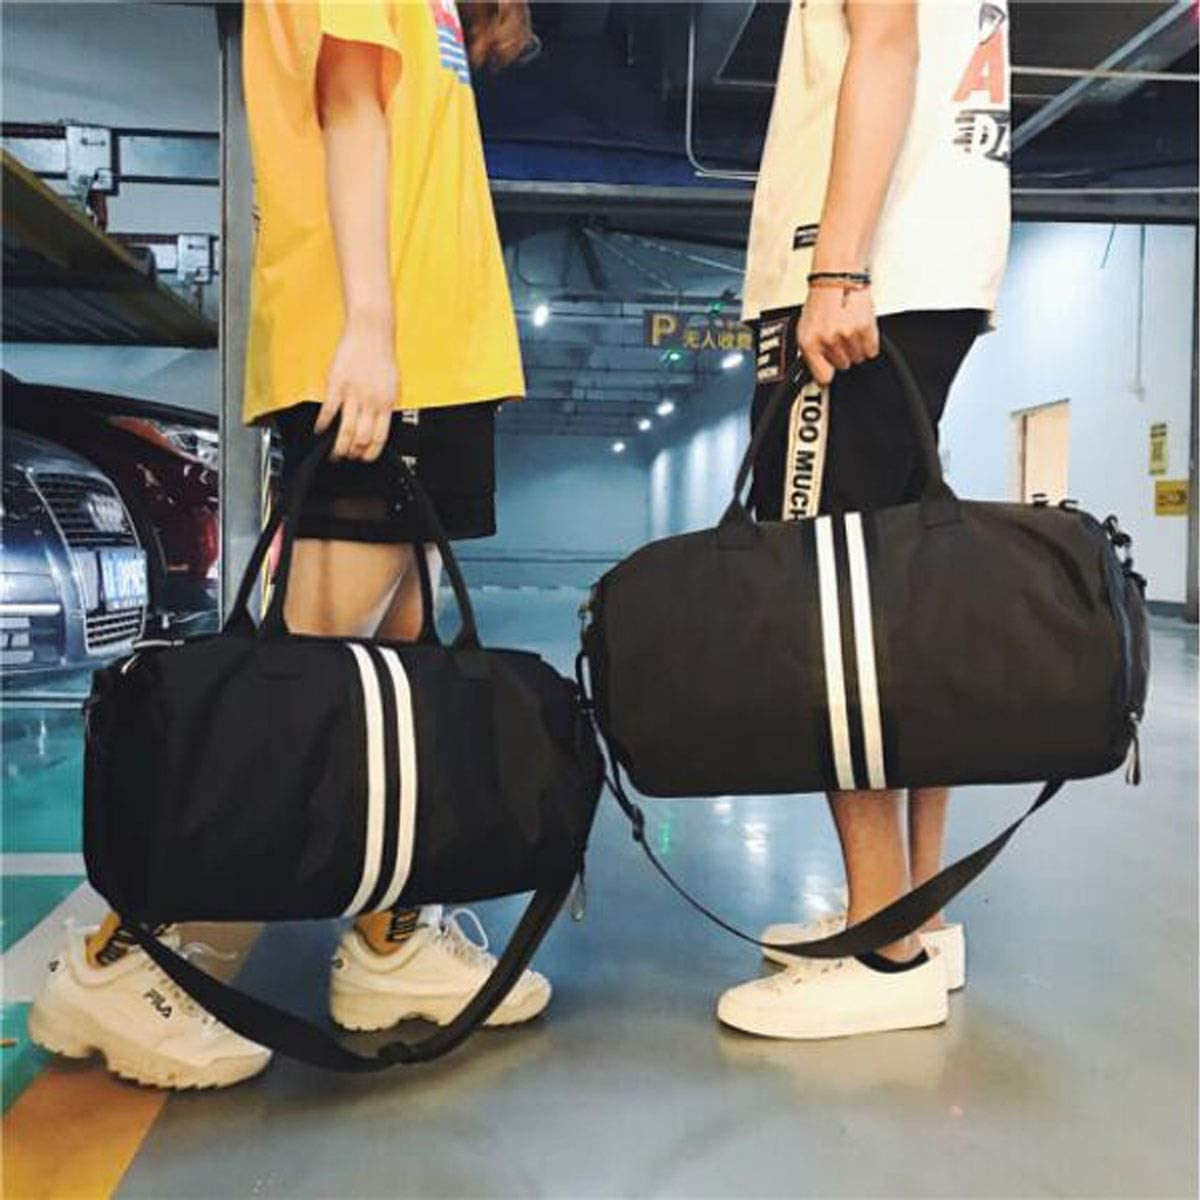 Large-Capacity Gym Bag Male Large-Capacity Travel Bag with Independent Shoe Warehouse Female Hand-held Korean Short-Distance Bag Travel Bag Hongyuantongxun Sports Bag Large Size: 50 15 43cm